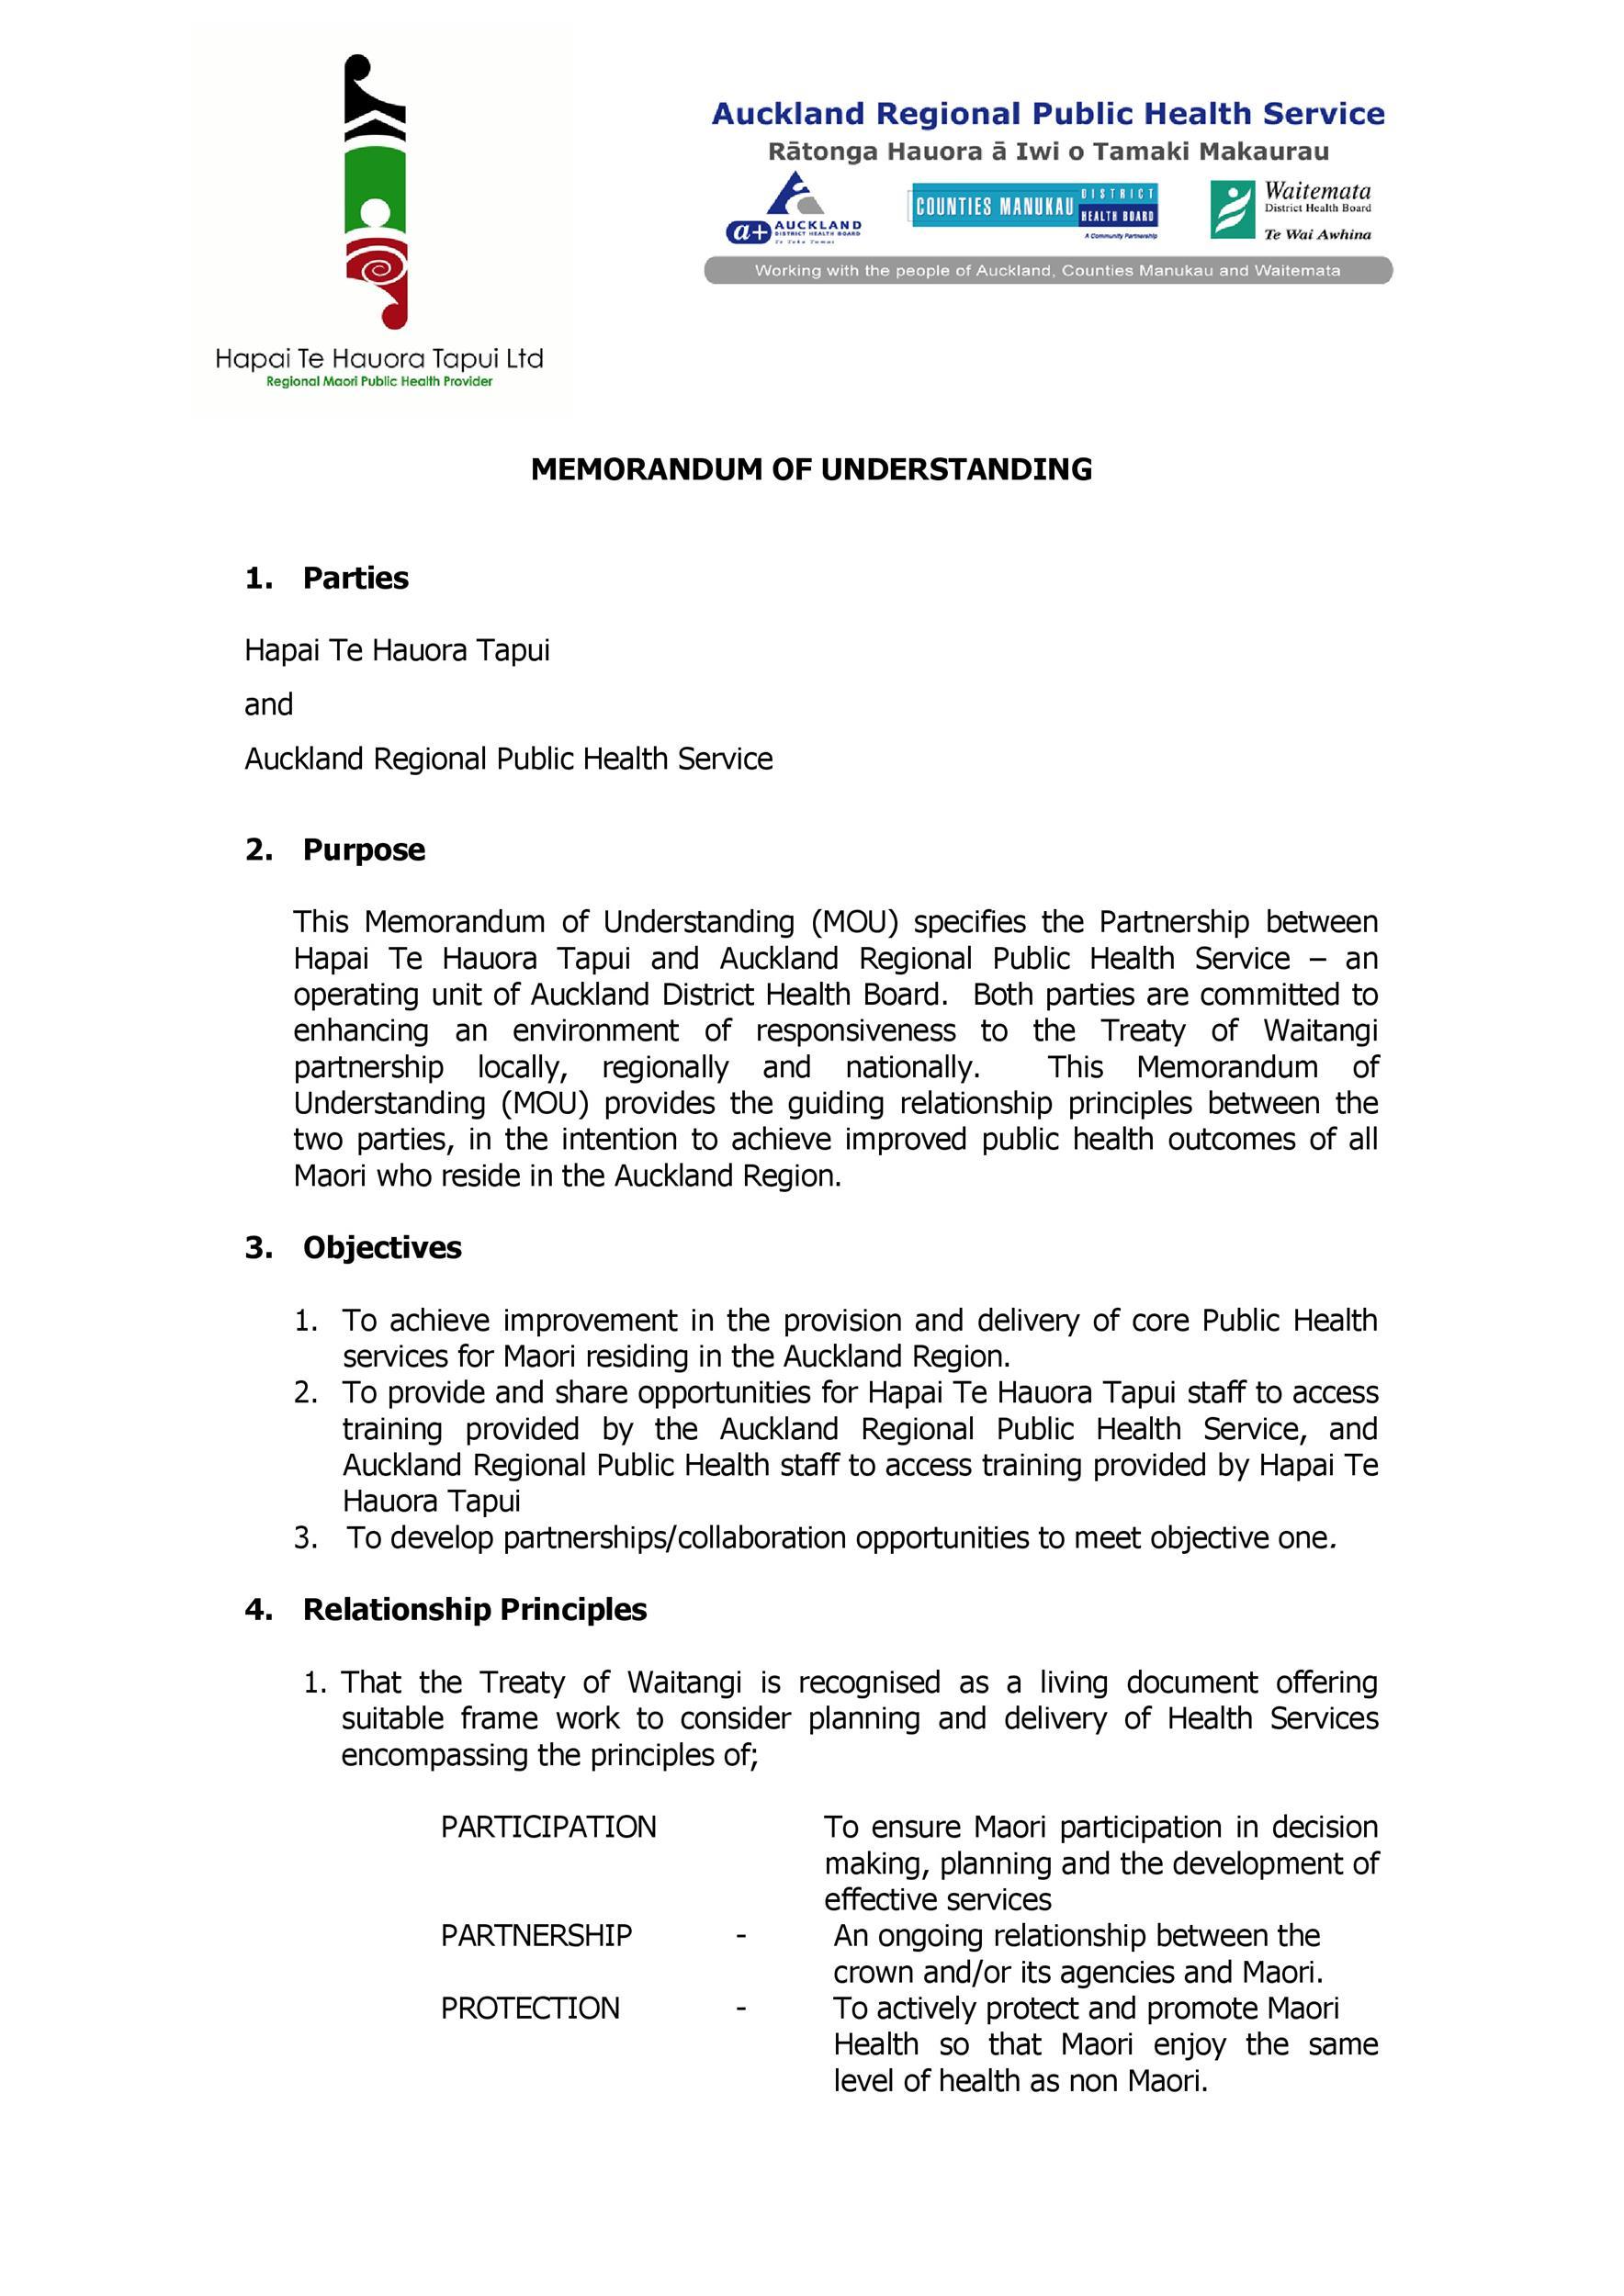 Free Memorandum of Understanding Template 34